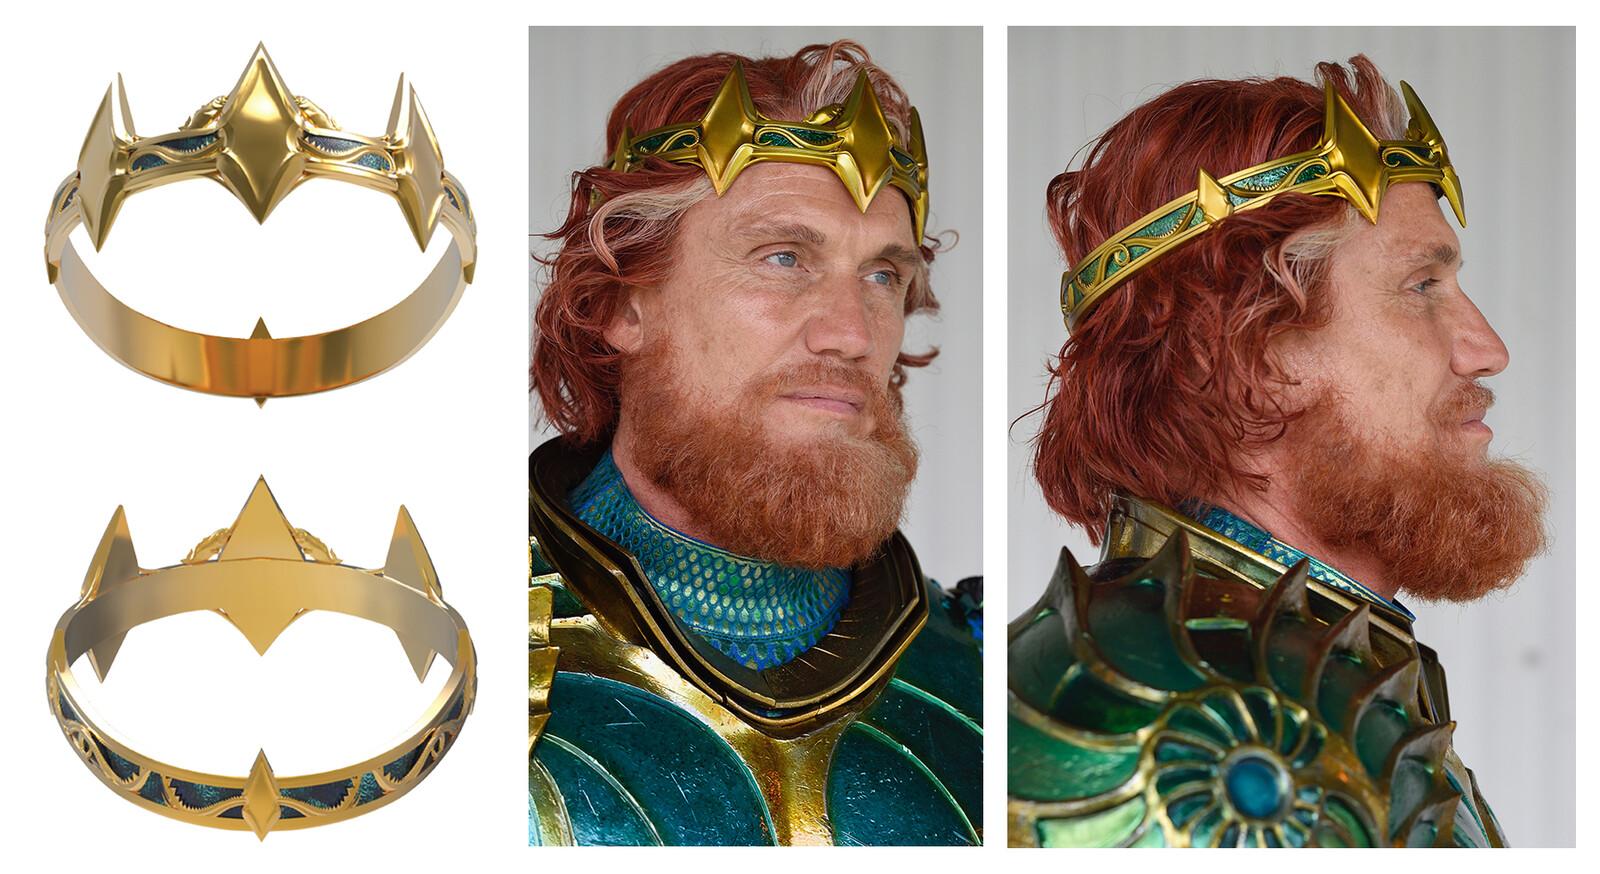 King Nereus - crown 3d modelled and 3d printed